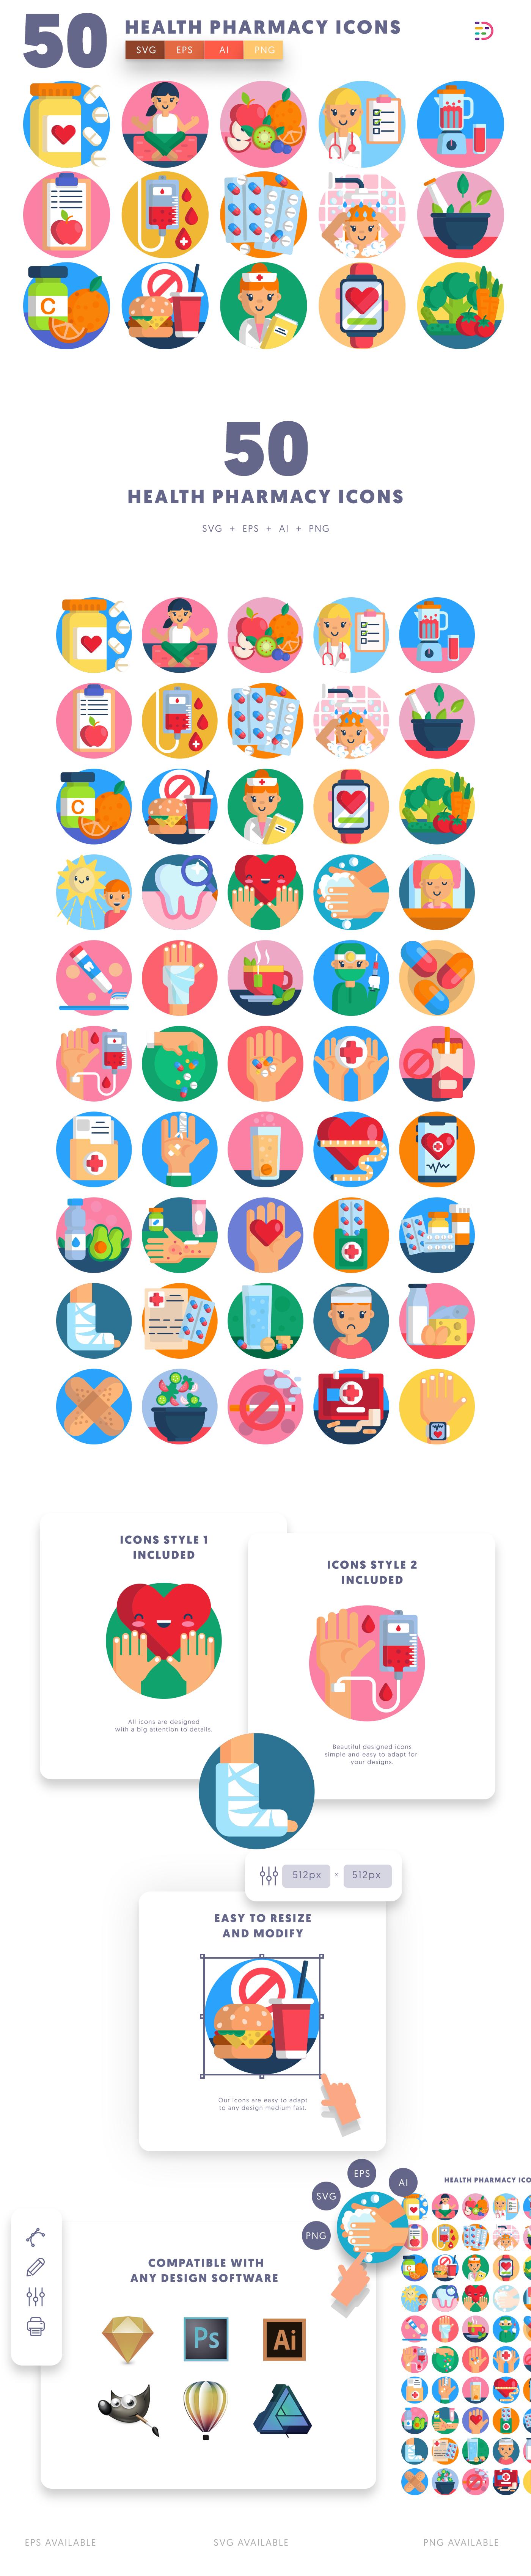 50 Health Pharmacy Icons list